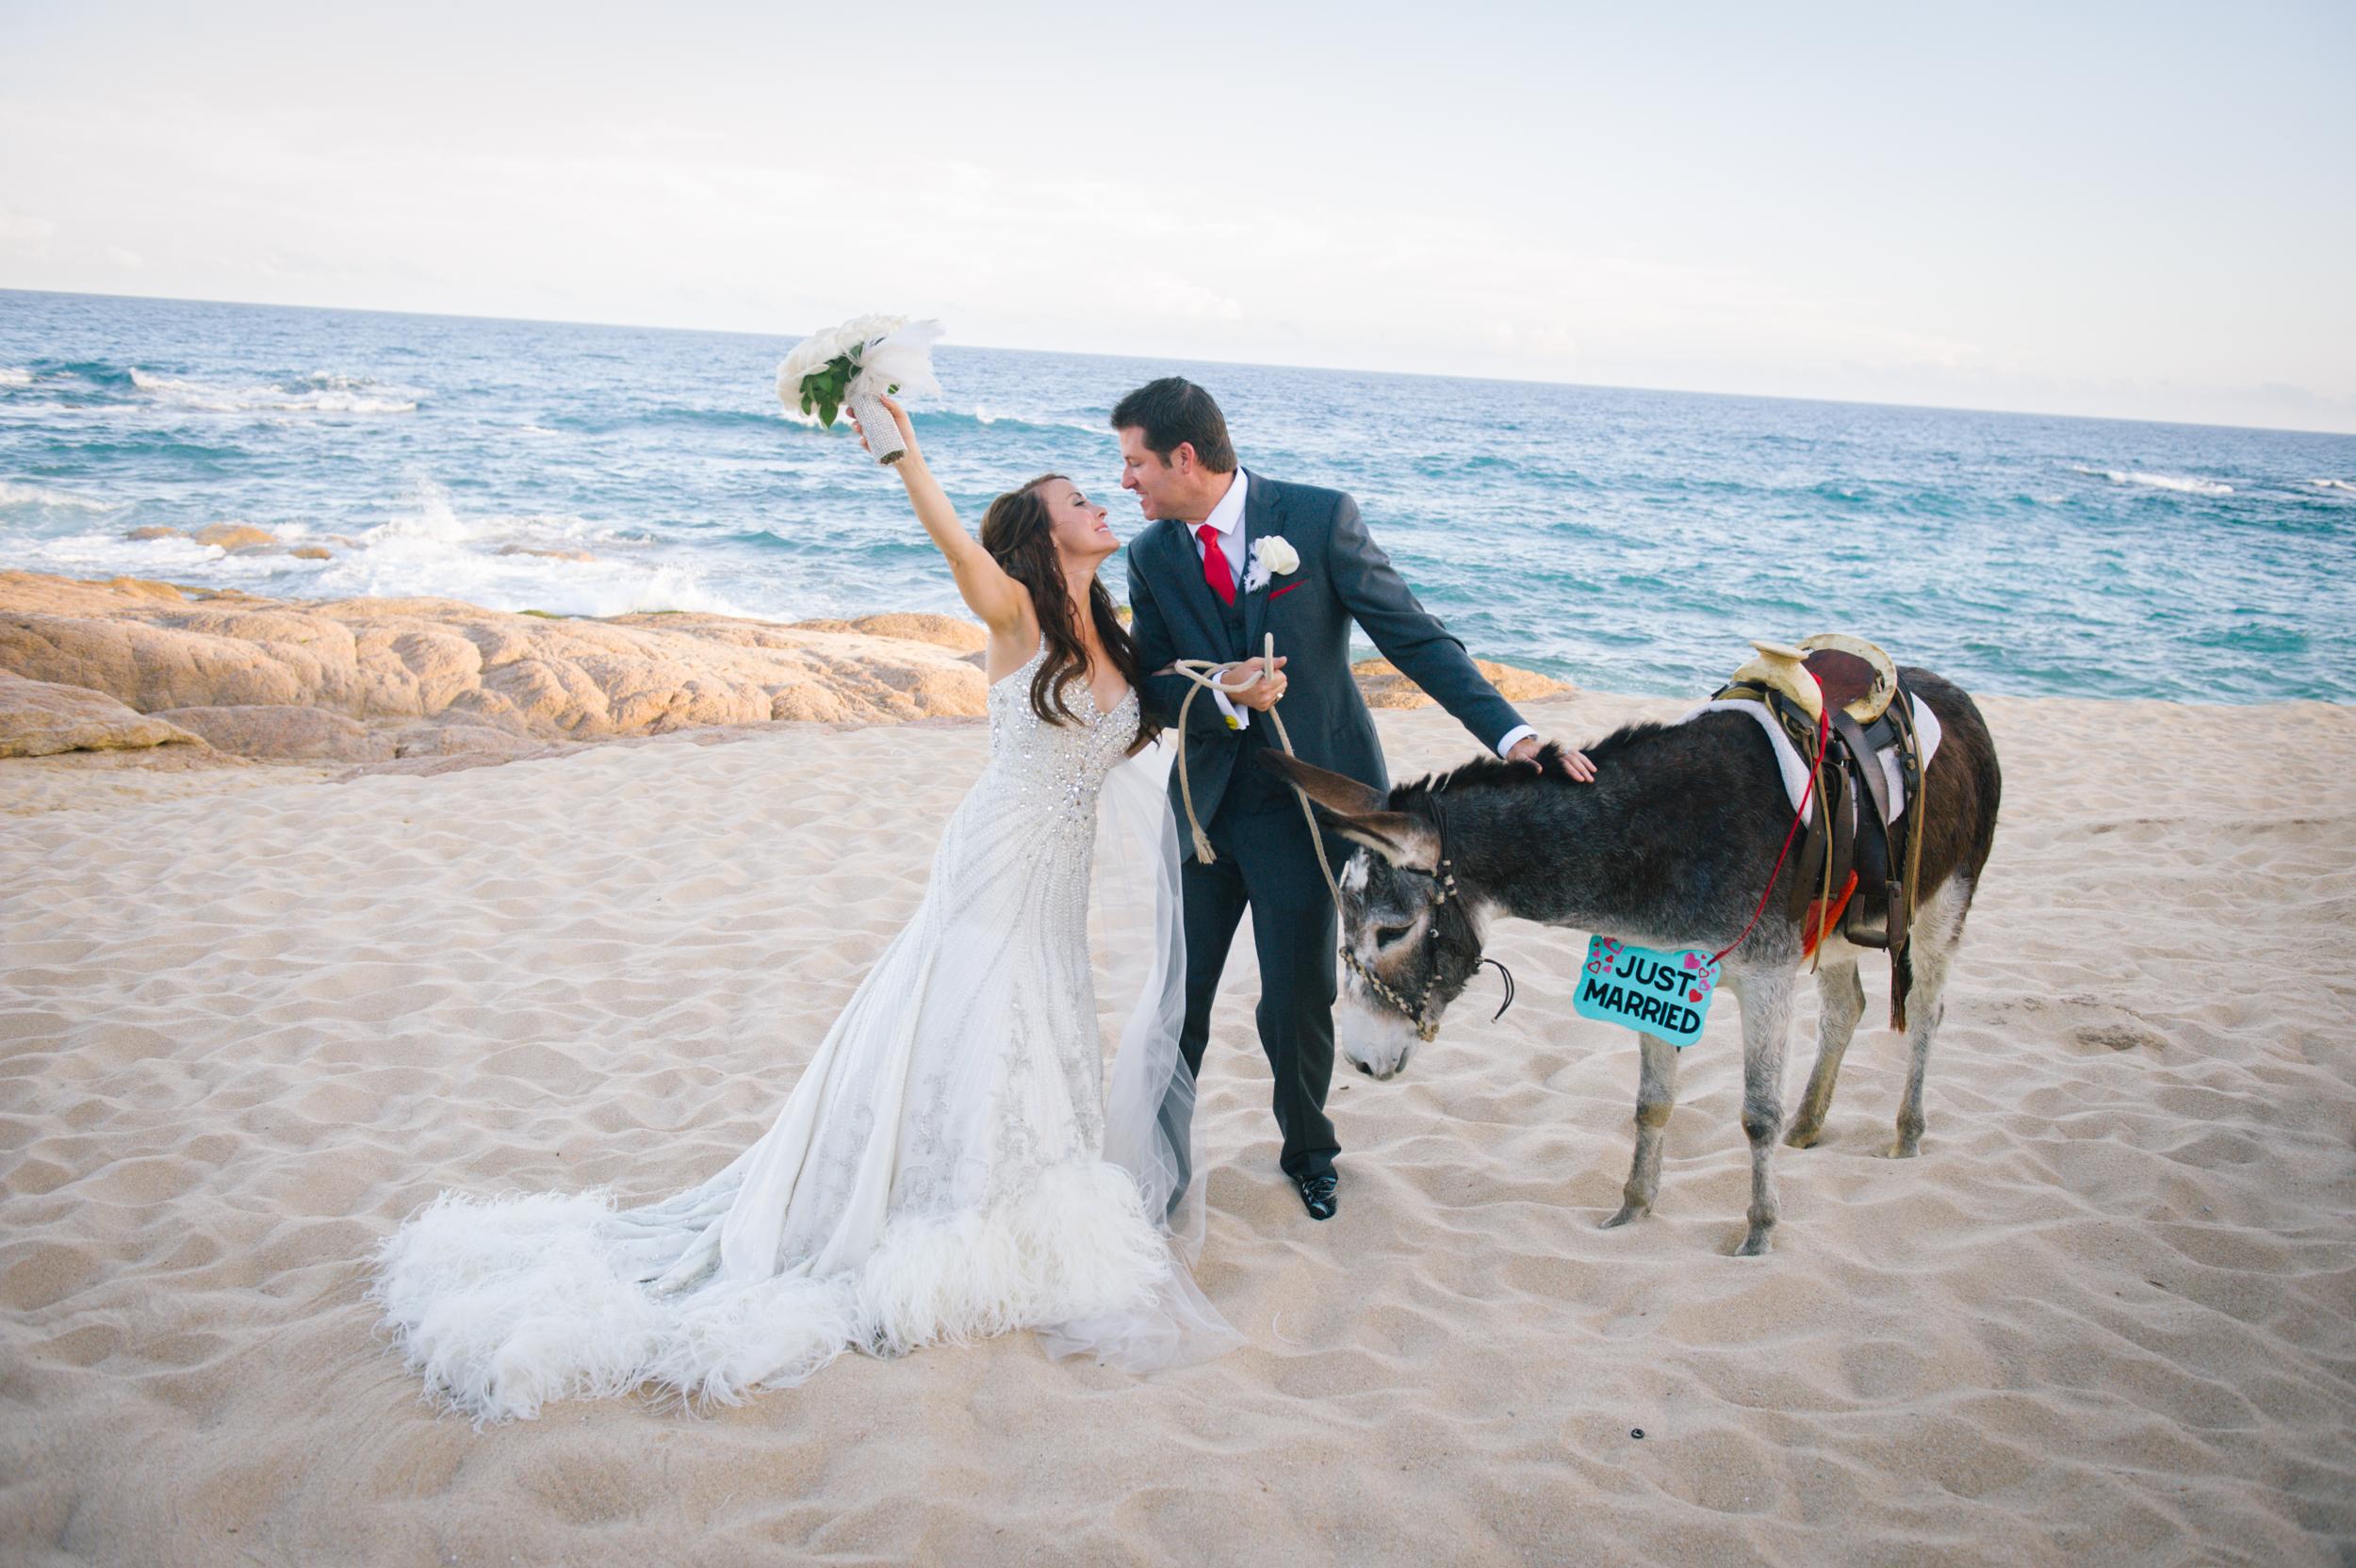 JKP-Destination-Weddings-0056.JPG